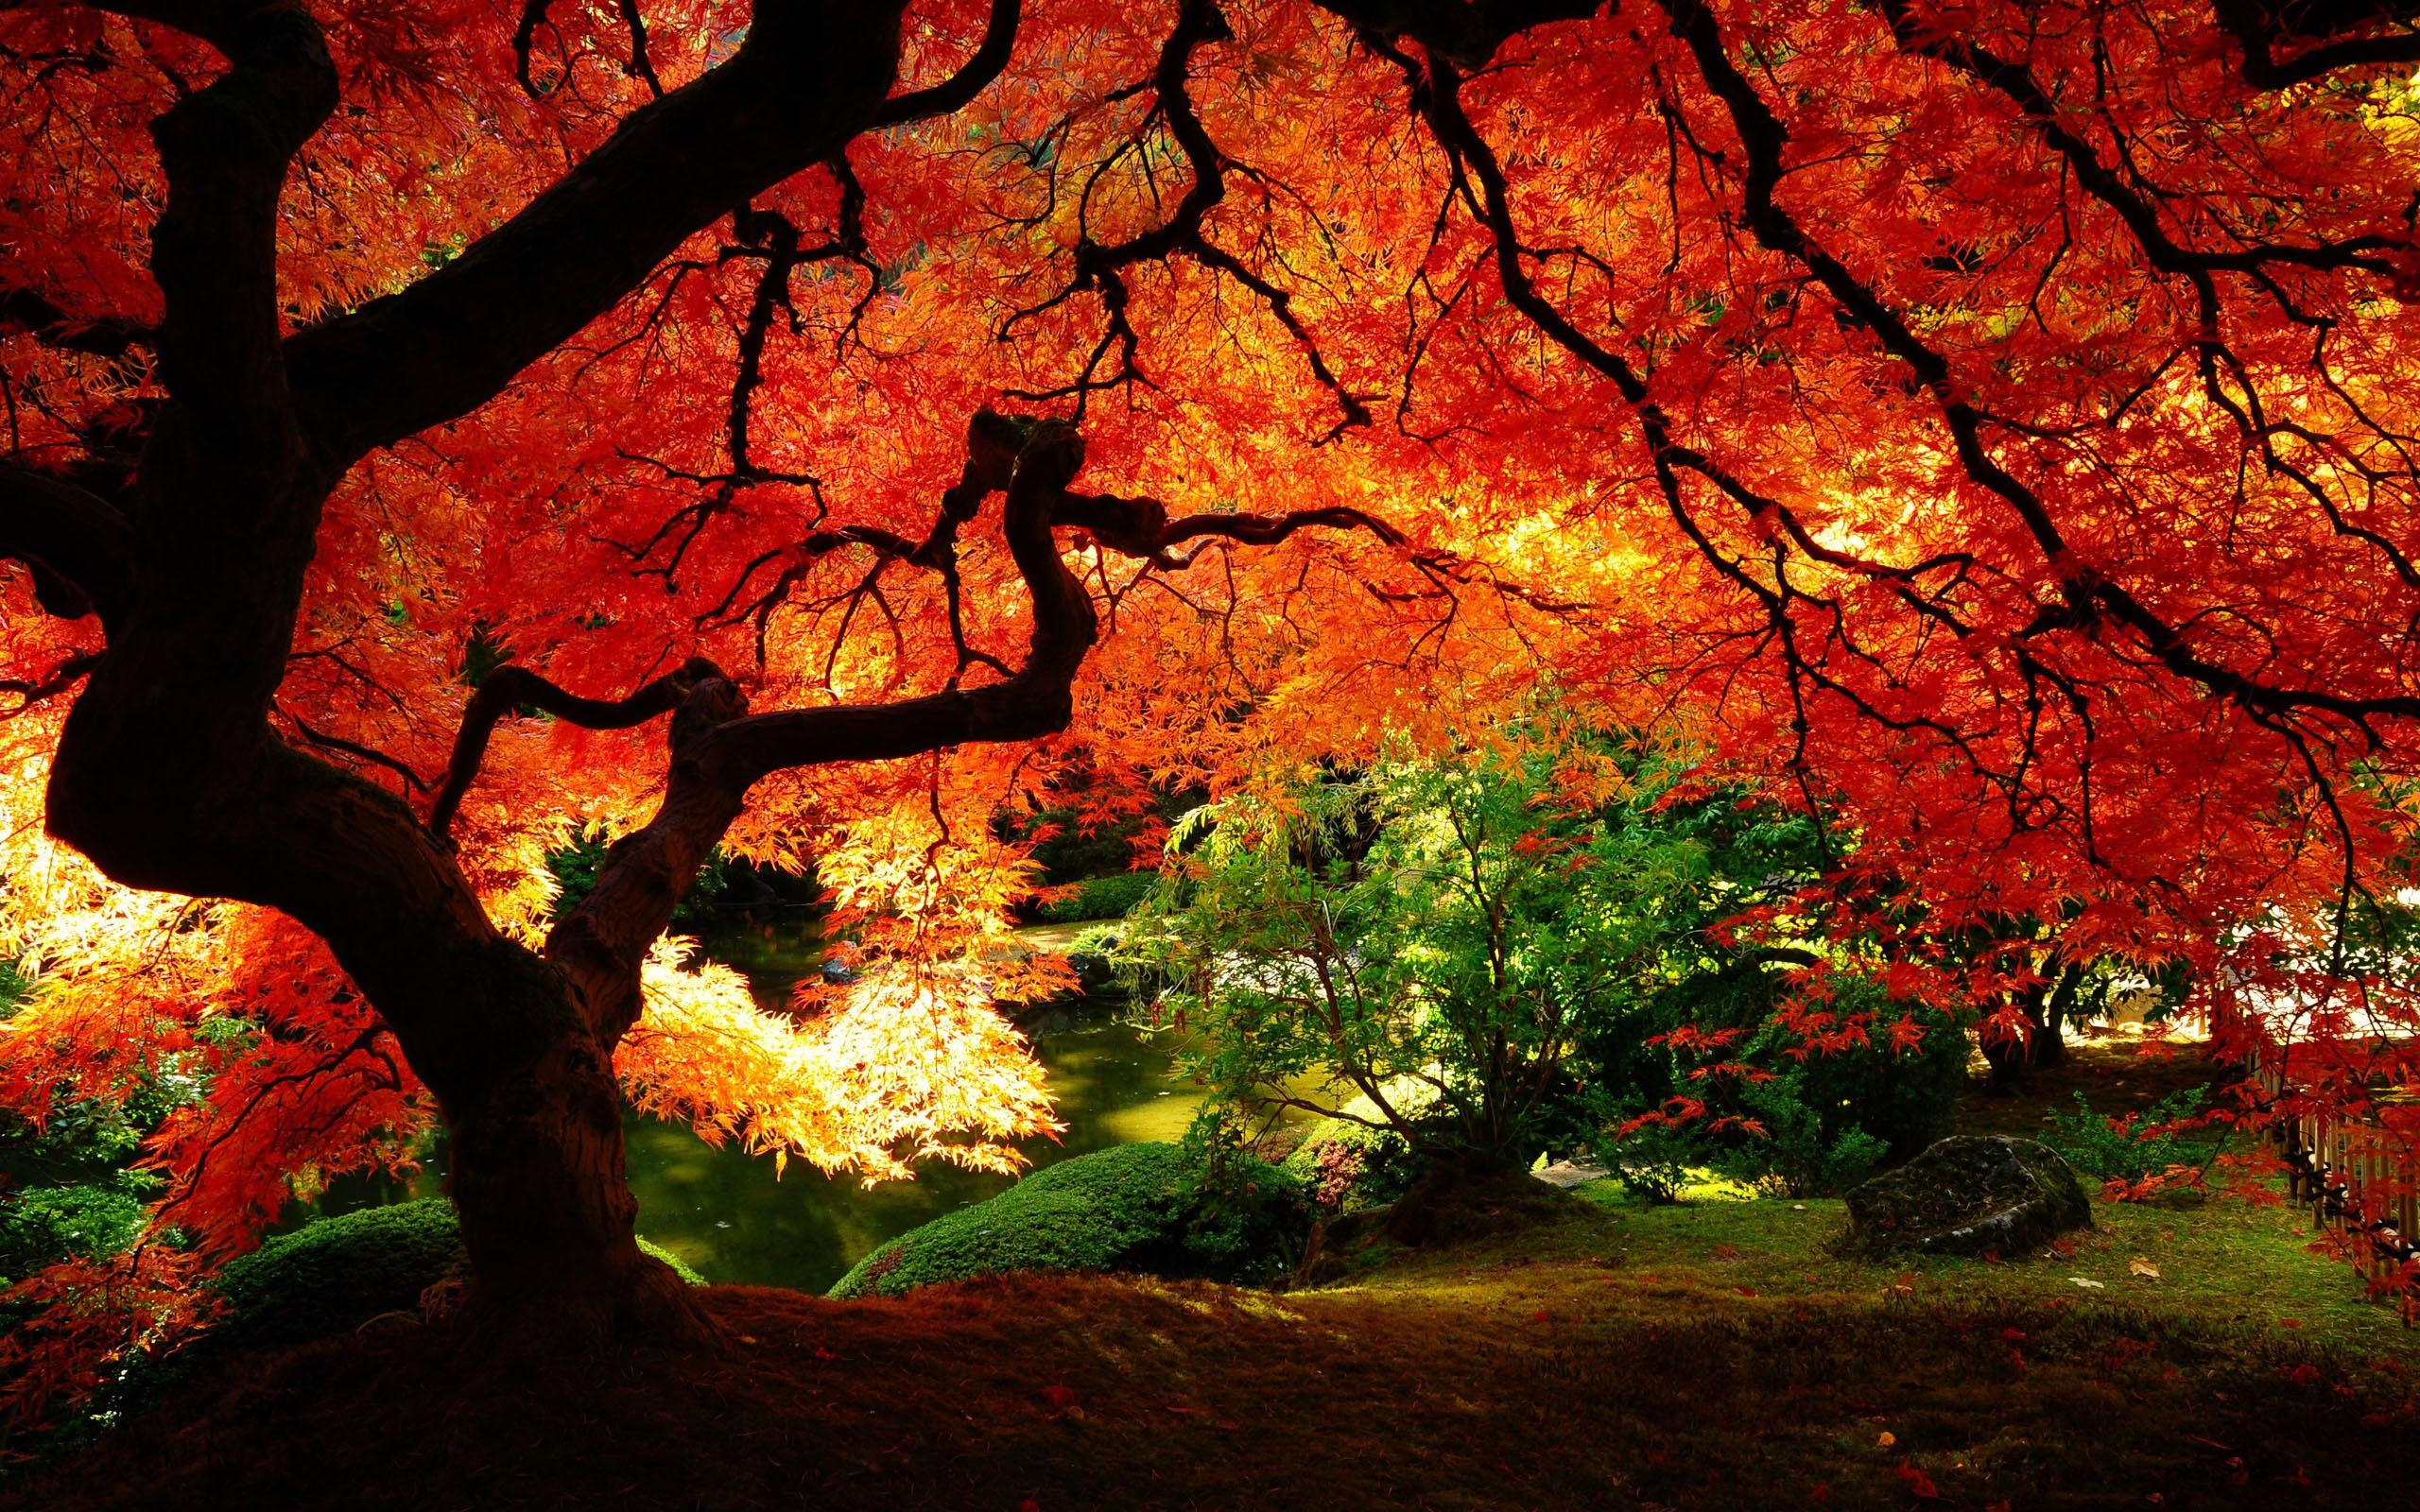 Hd wallpaper background id 330278 2560x1600 earth tree